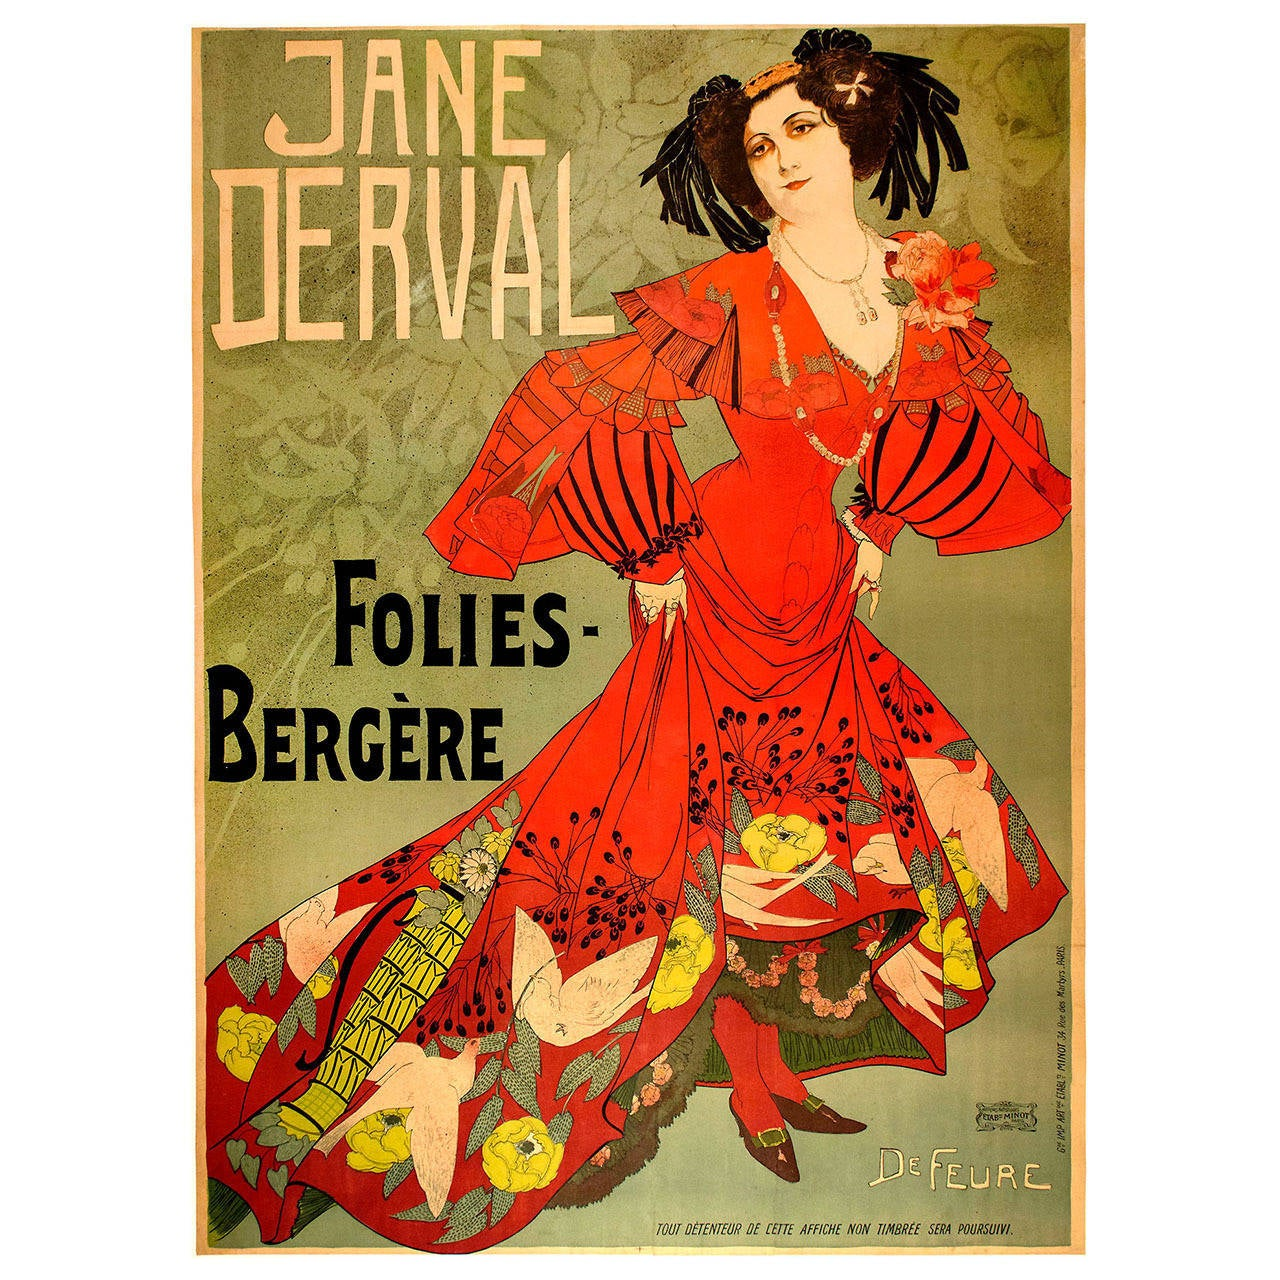 Original Poster for the Folies-Bergere by de Feure